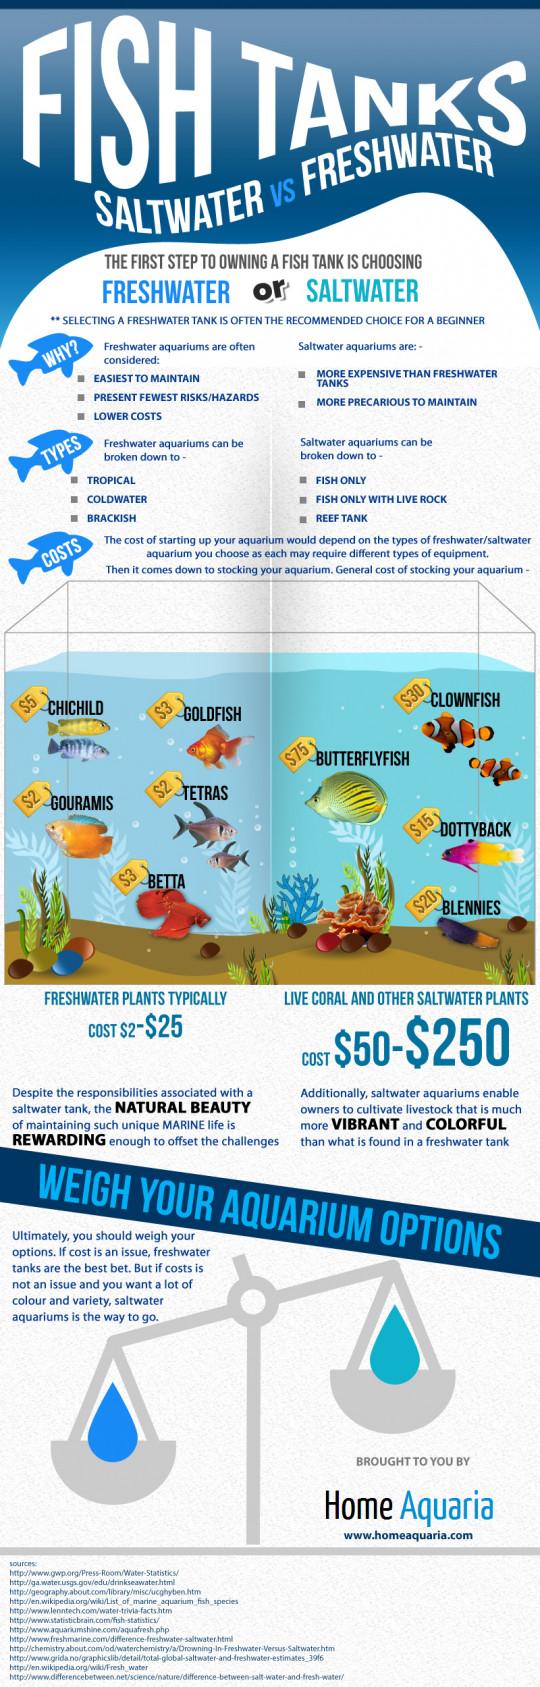 Saltwater vs Freshwater Aquariums